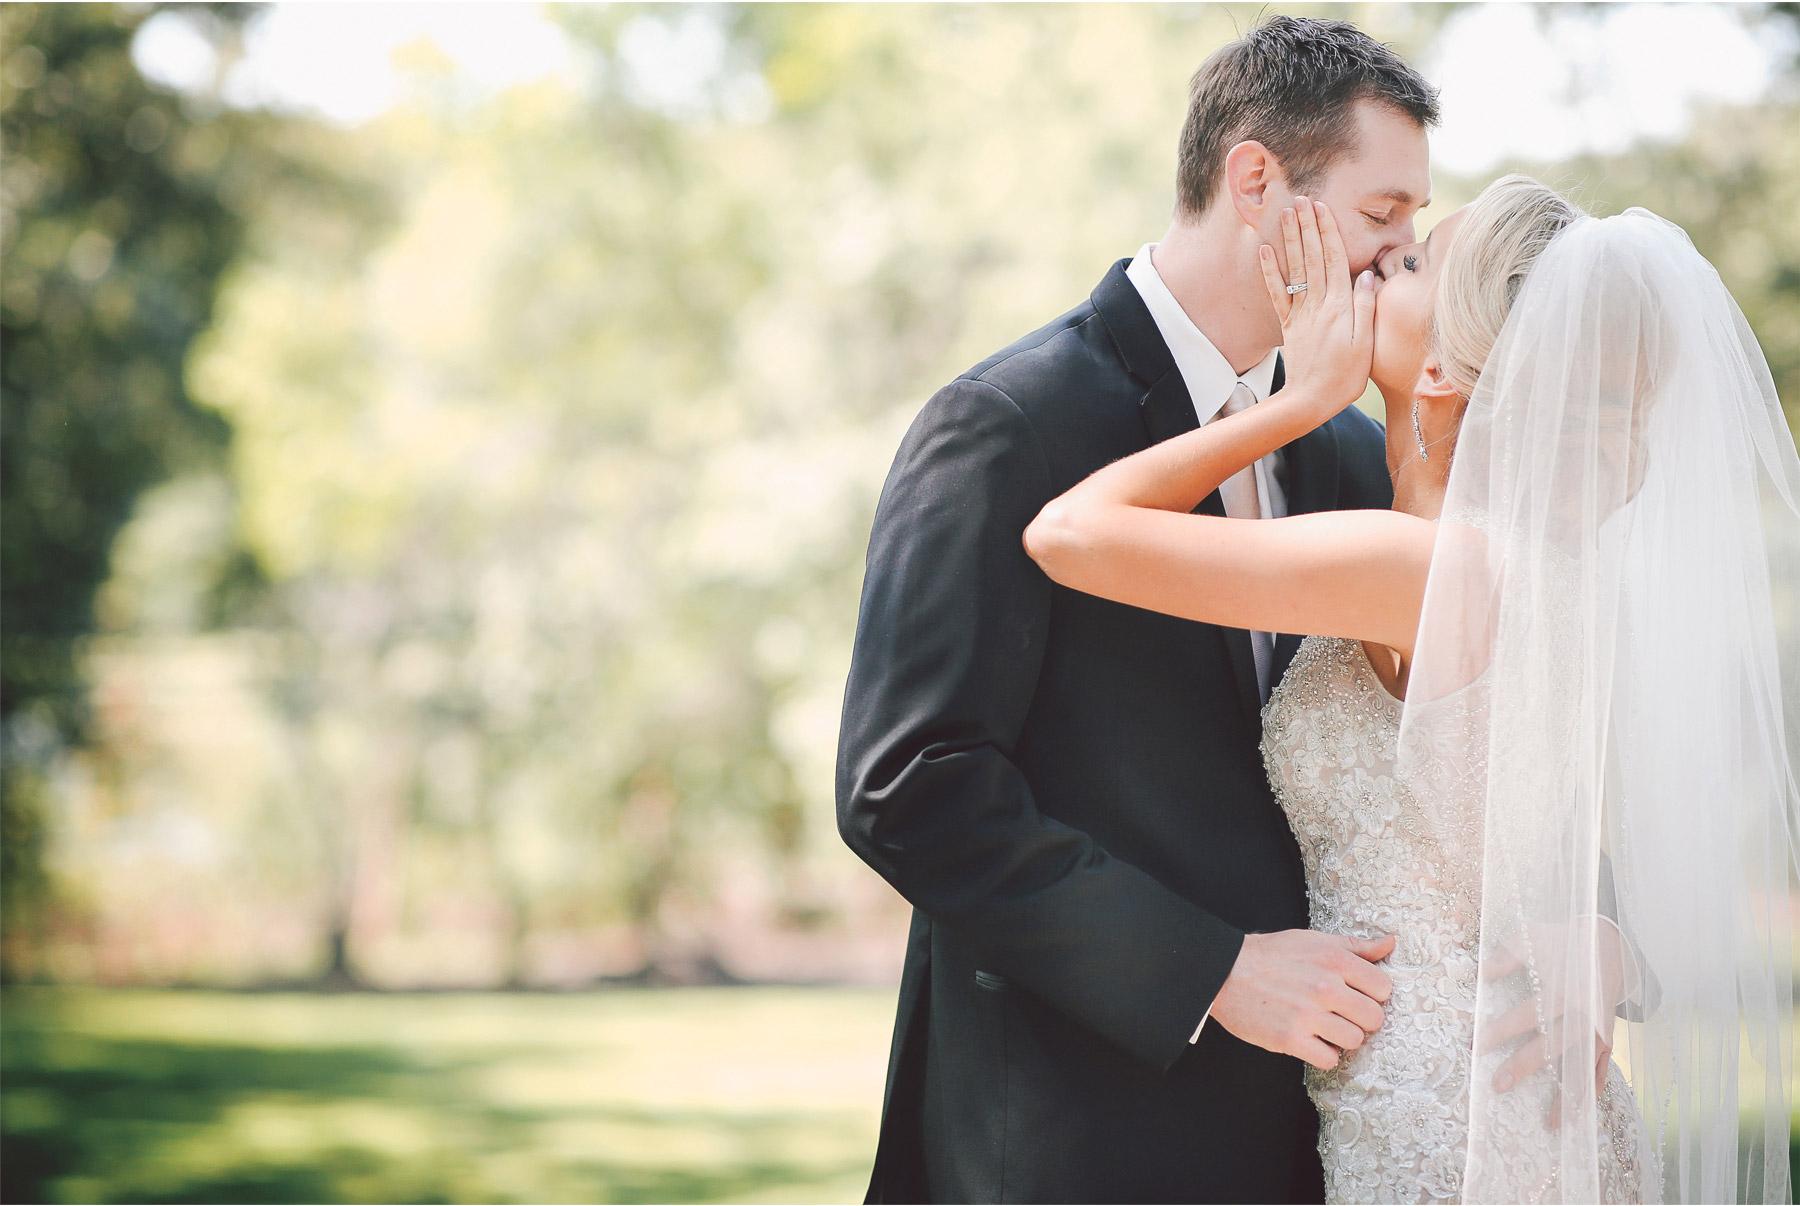 04-Minneapolis-Minnesota-Wedding-Photography-by-Vick-Photography-First-Look-Jenna-and-Josh.jpg